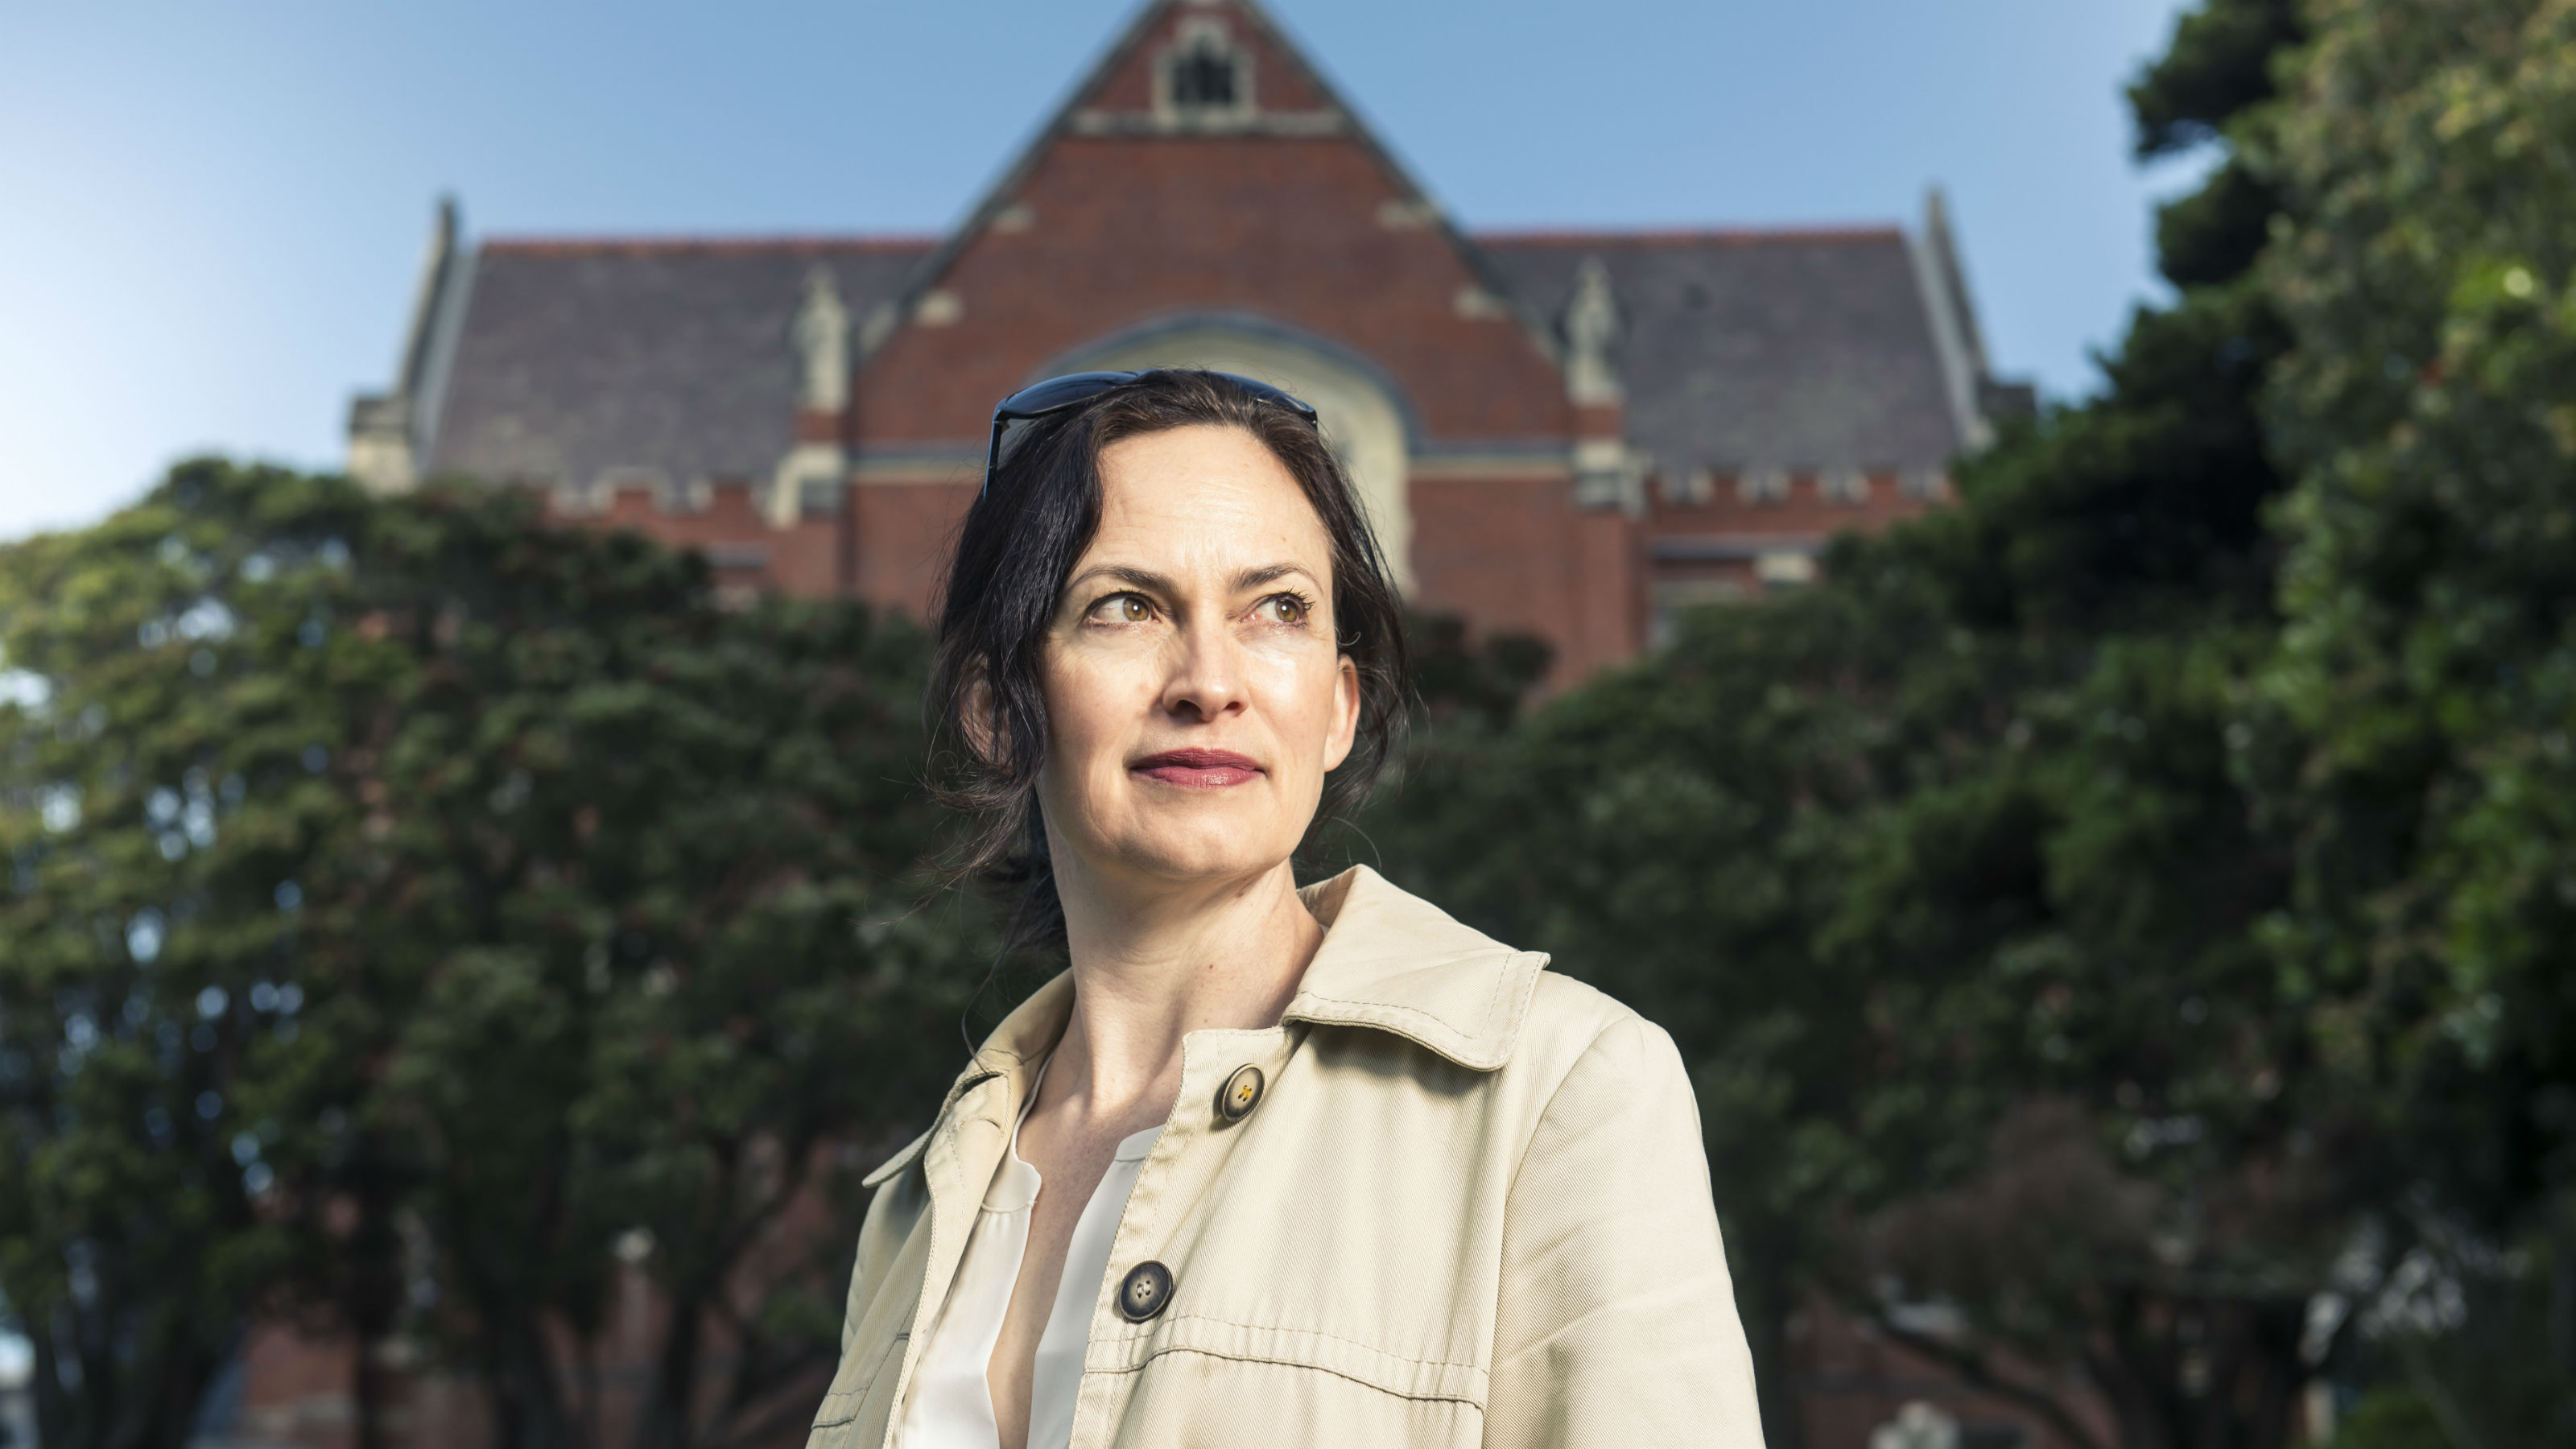 Associate Professor Rebecca Priestley stands outside the red brick hunter building